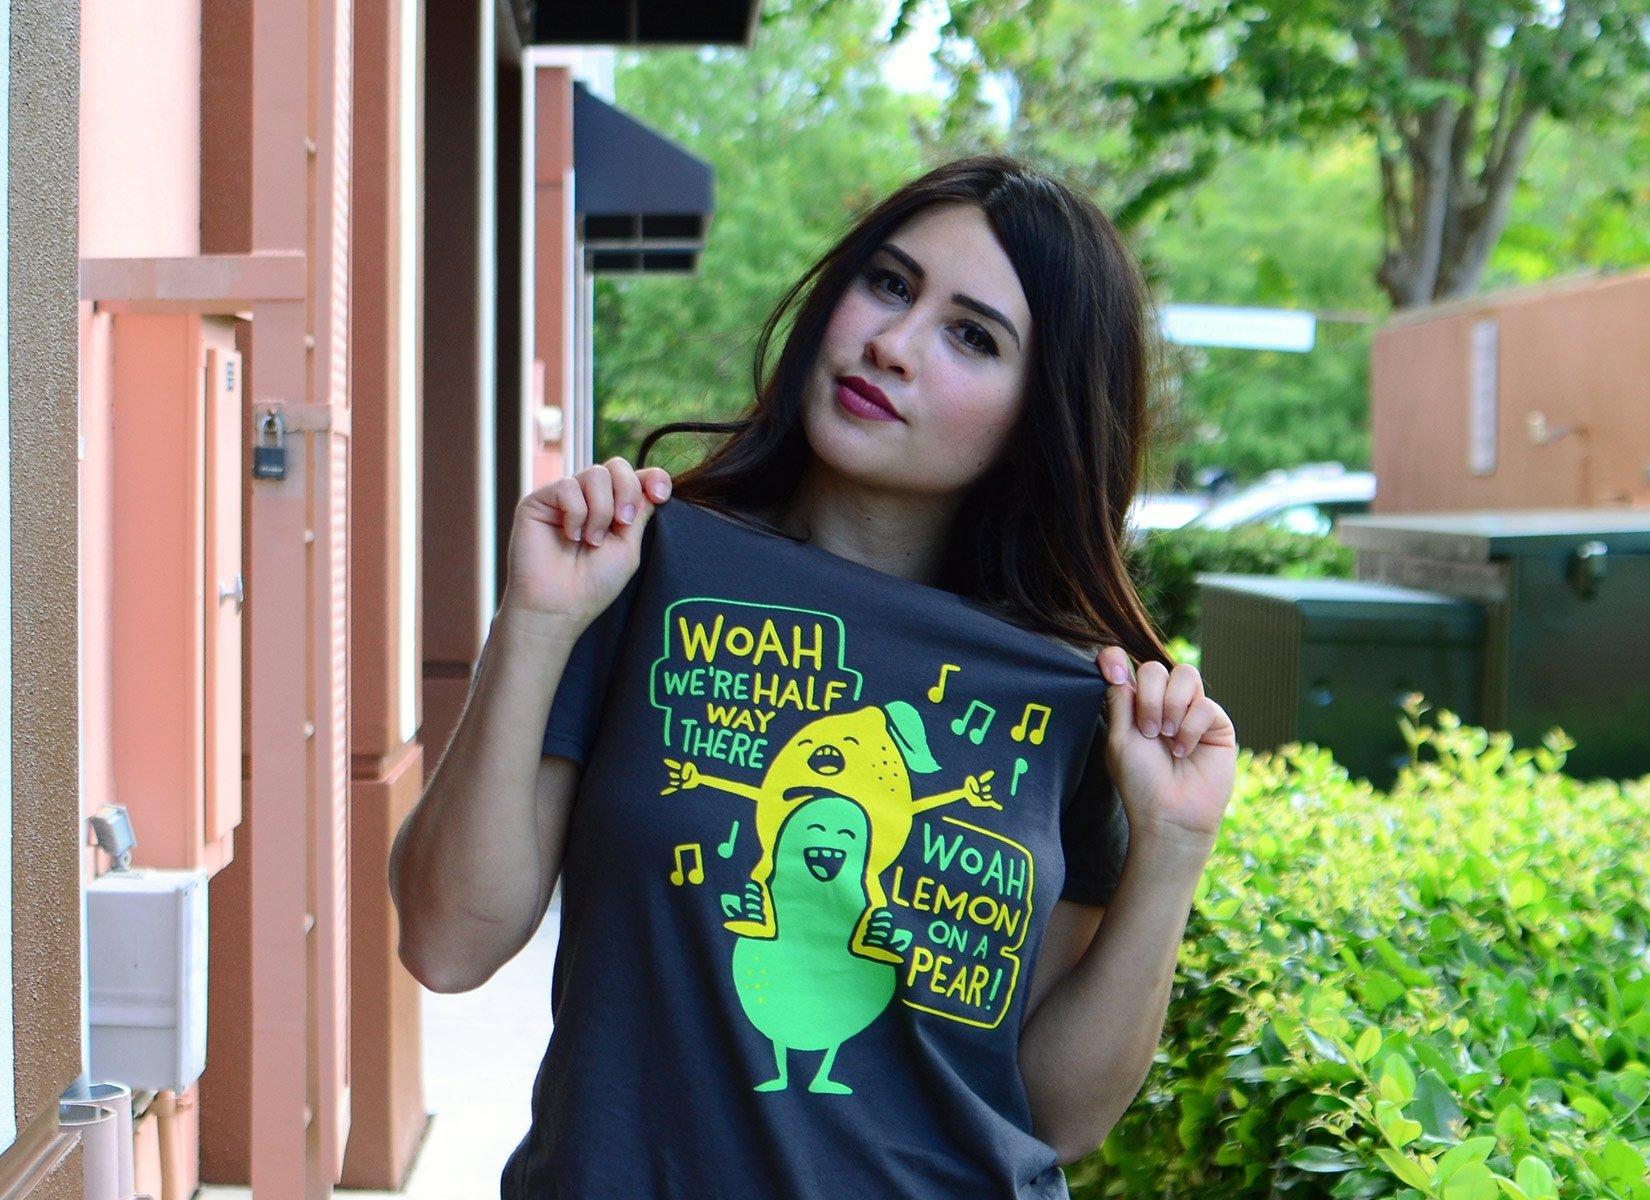 Lemon On A Pear on Womens T-Shirt